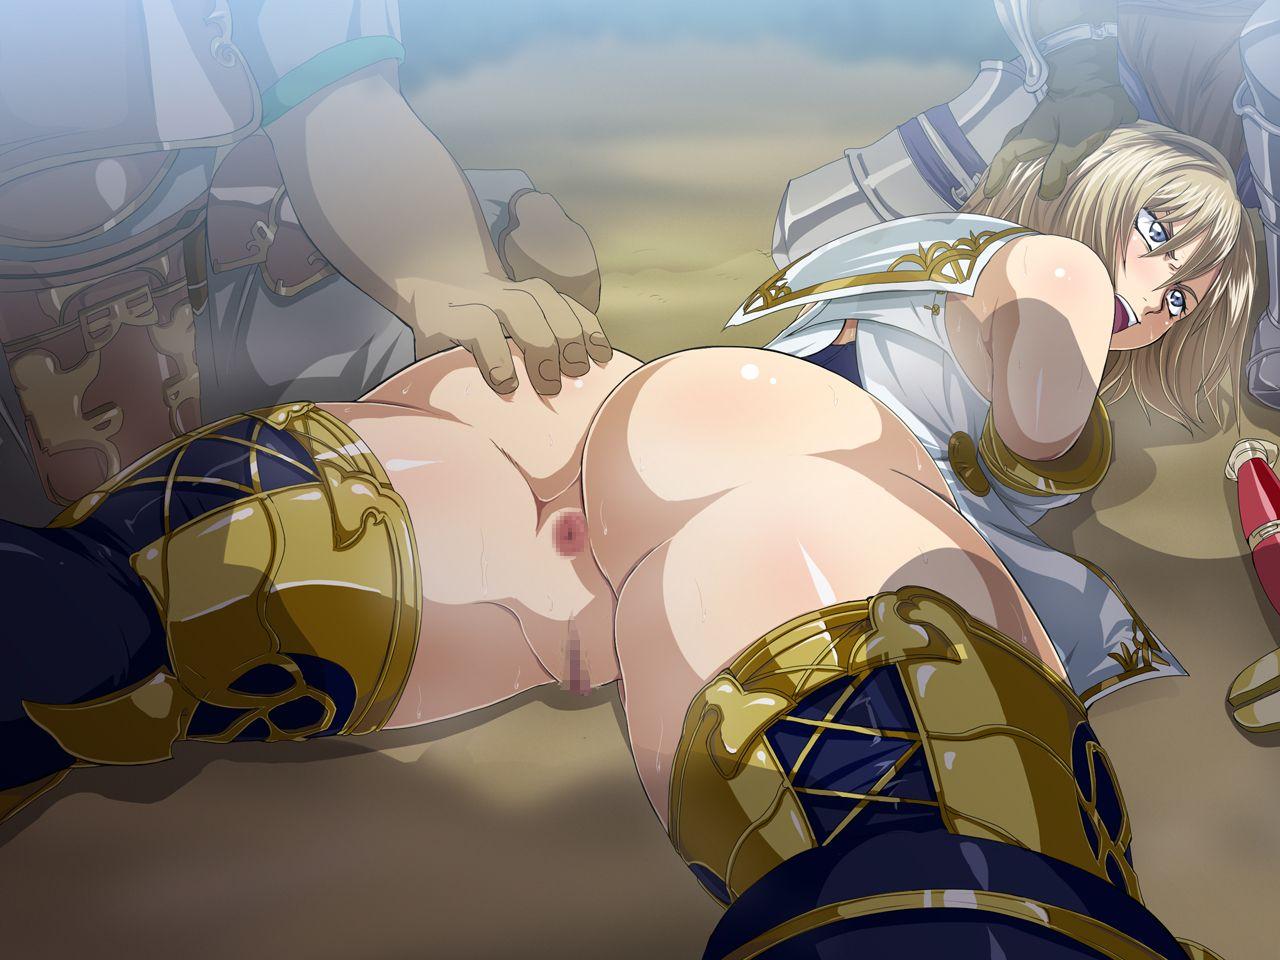 Hentai final fantasy xii